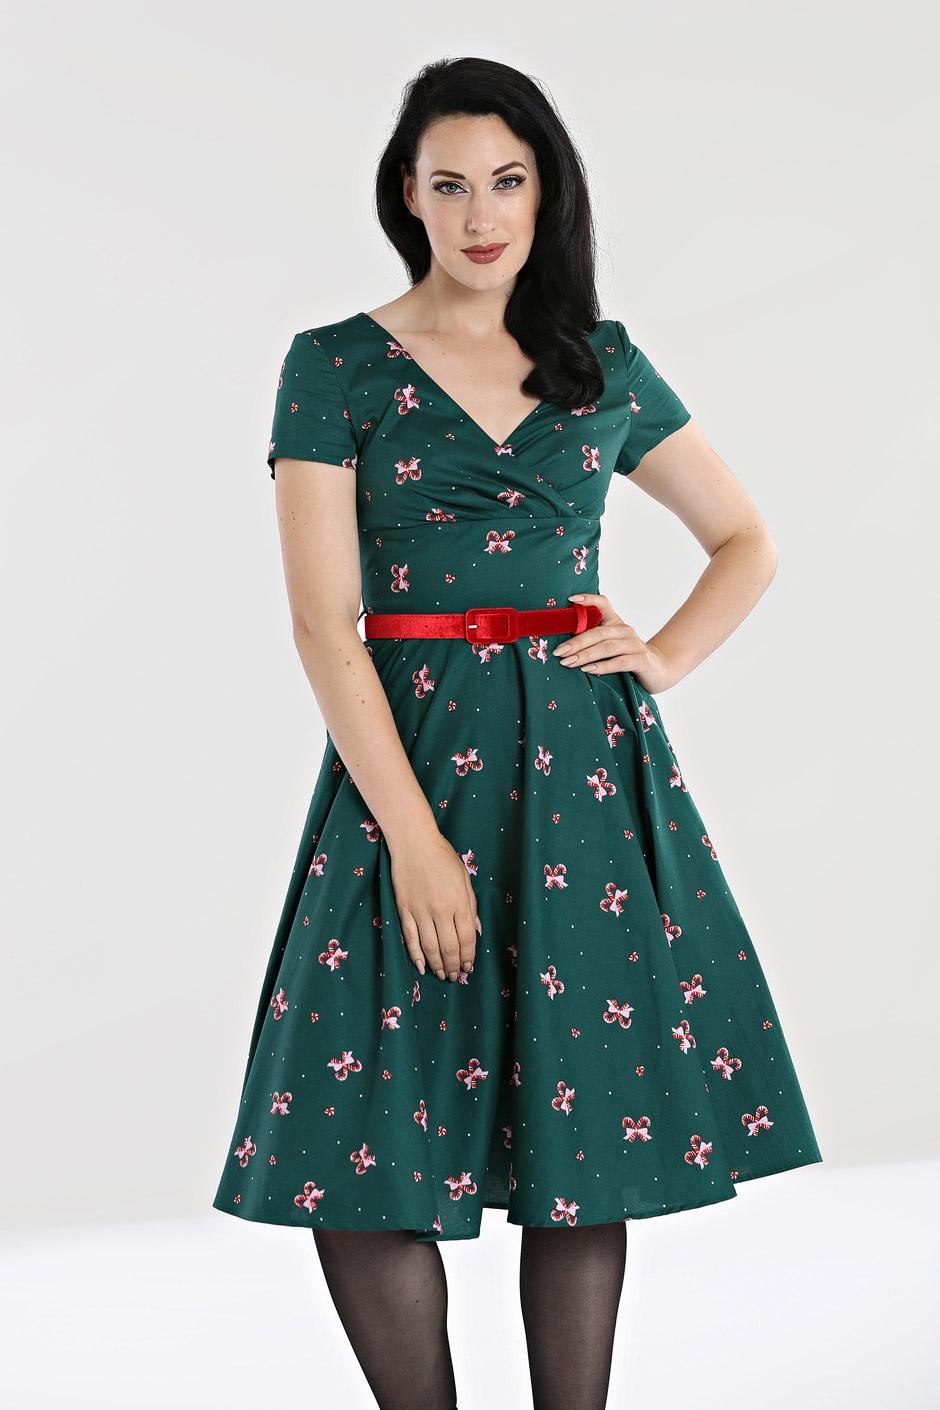 robe années 50 swing,